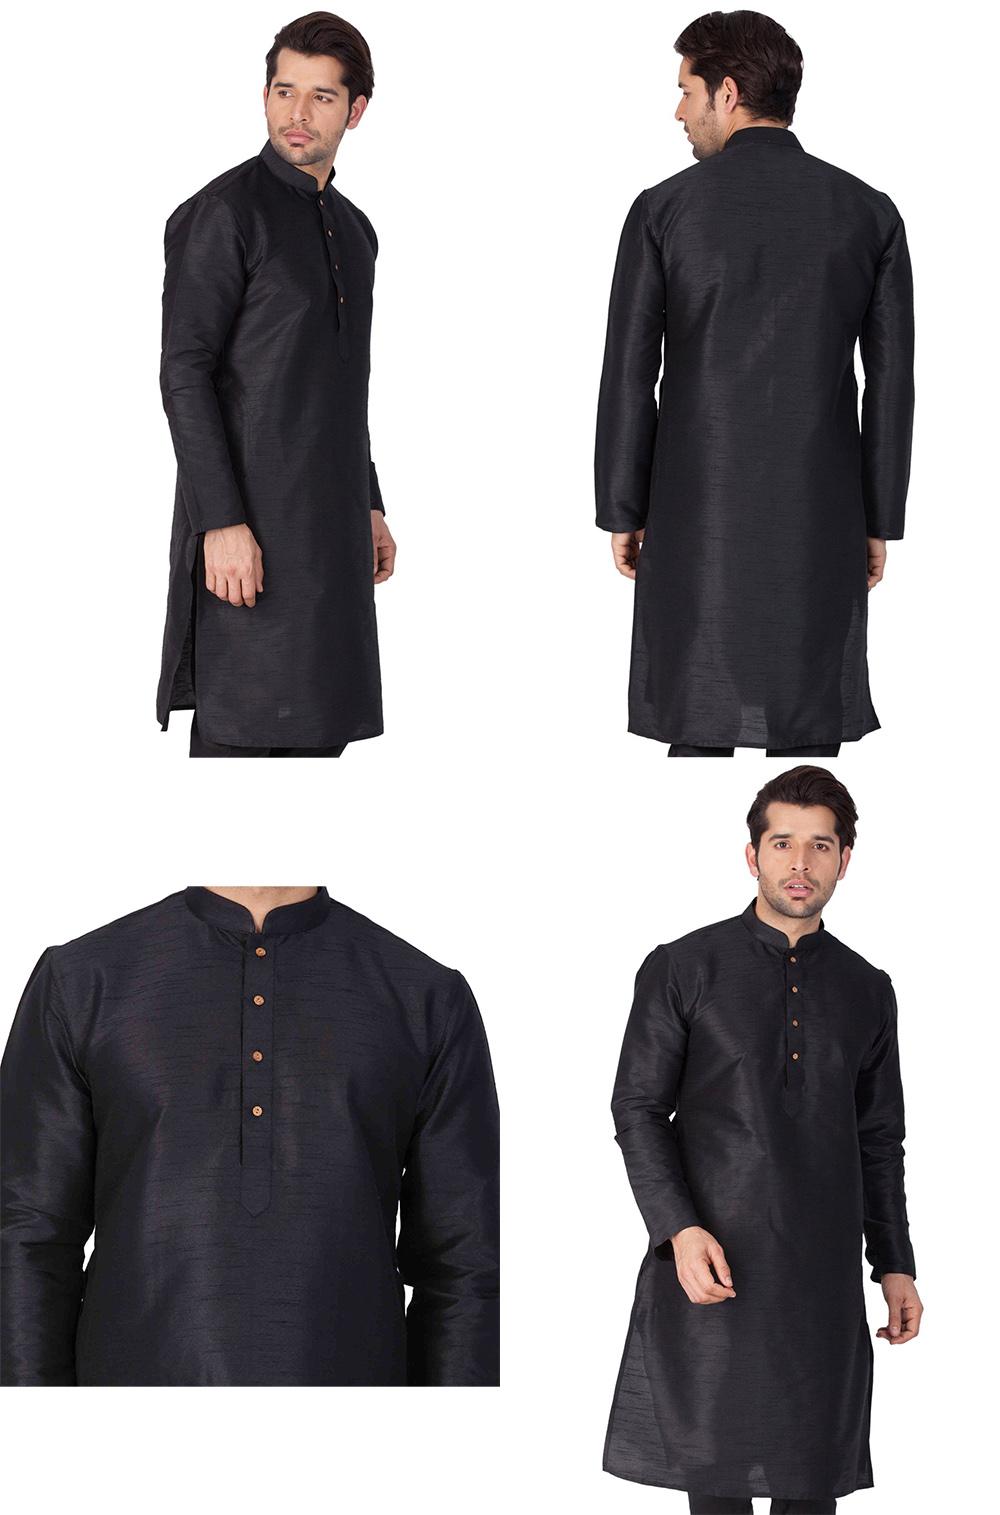 DESIGNER INDIAN KURTA-600053-3XL - $49.99